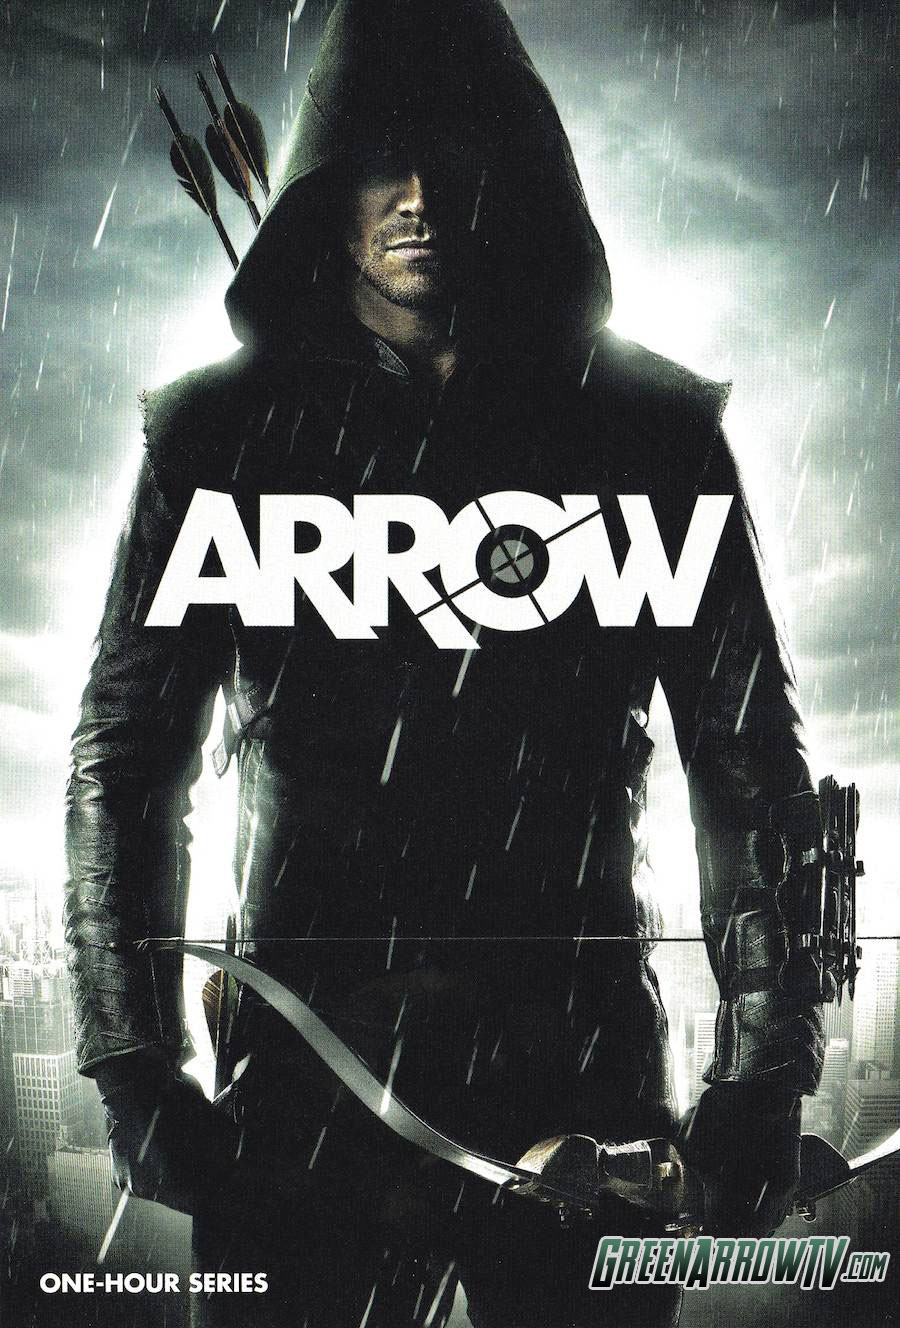 Arrow S06 E07